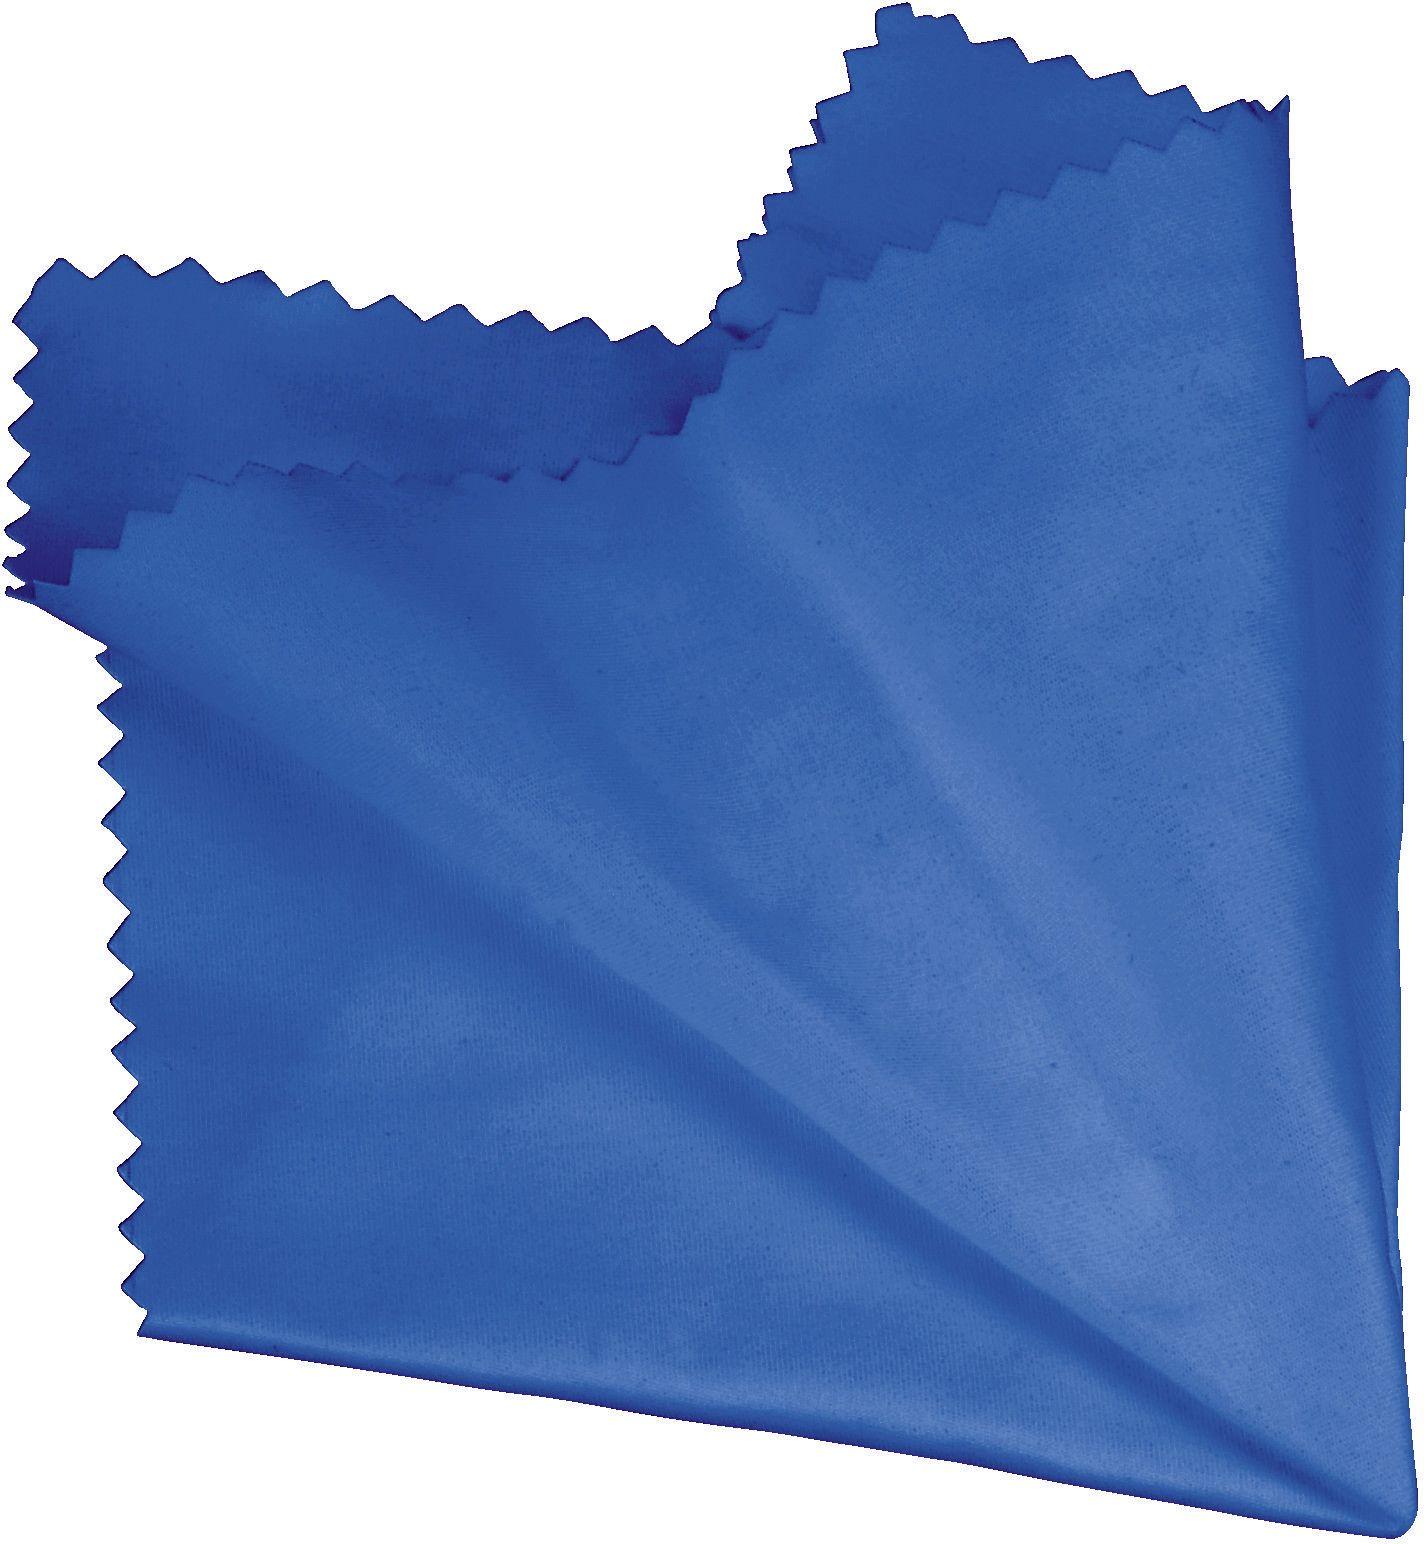 Hama Universal Cleaning Cloth